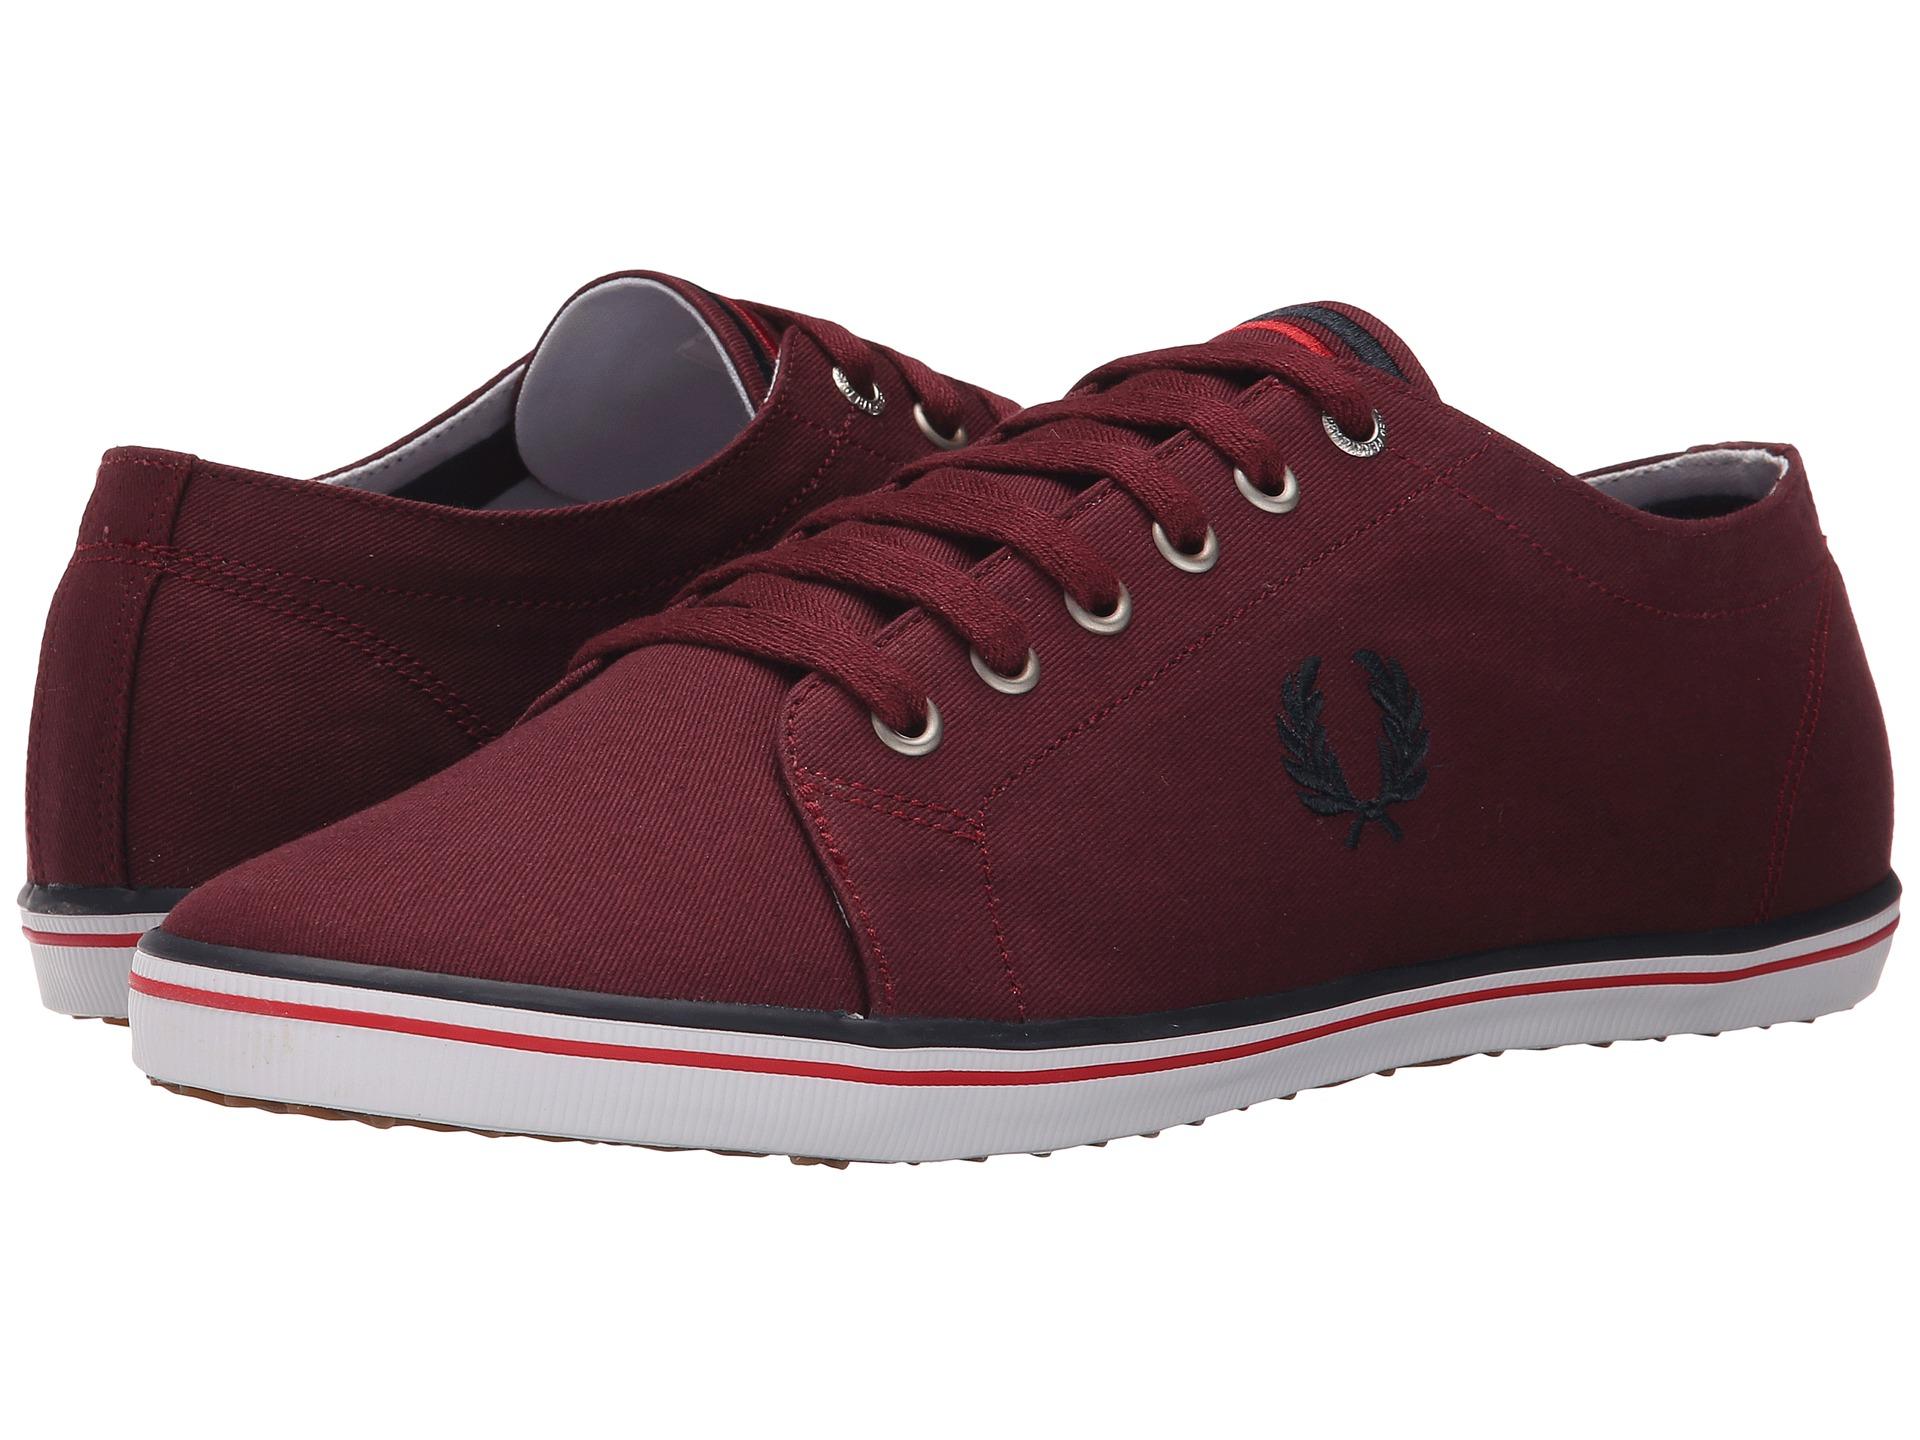 Skate shoes kingston - Gallery